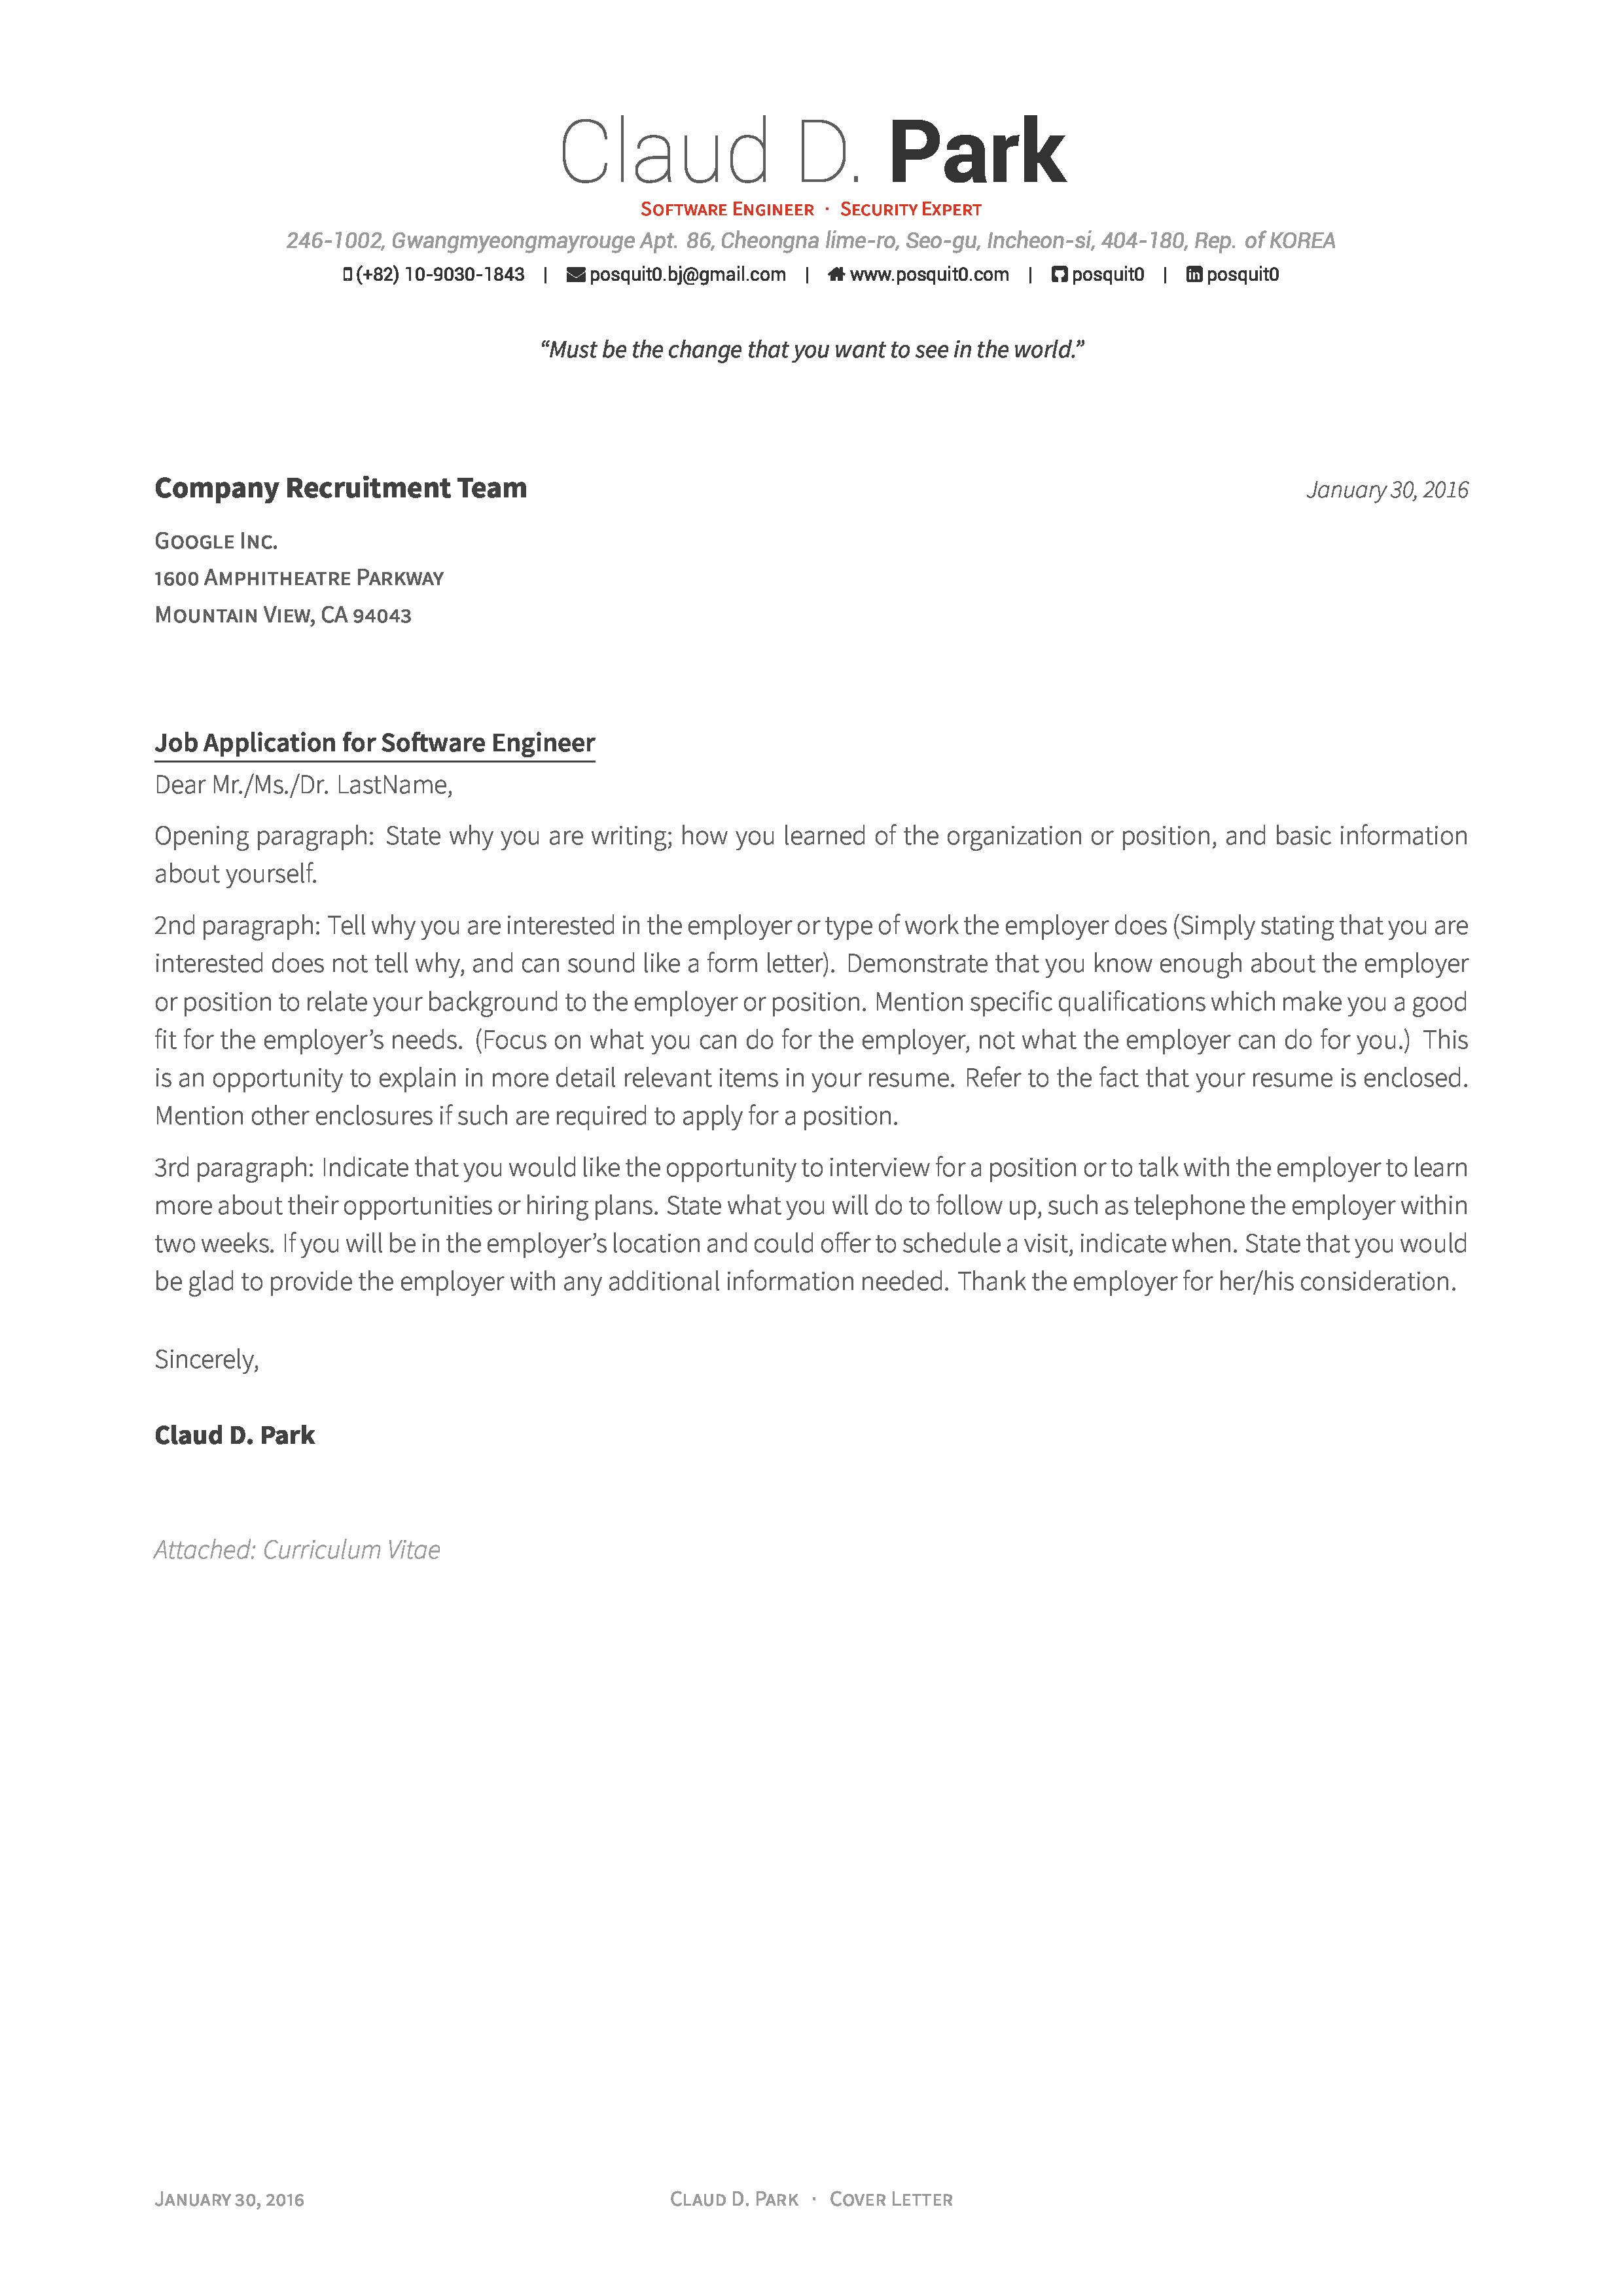 Cover Letter Template Overleaf